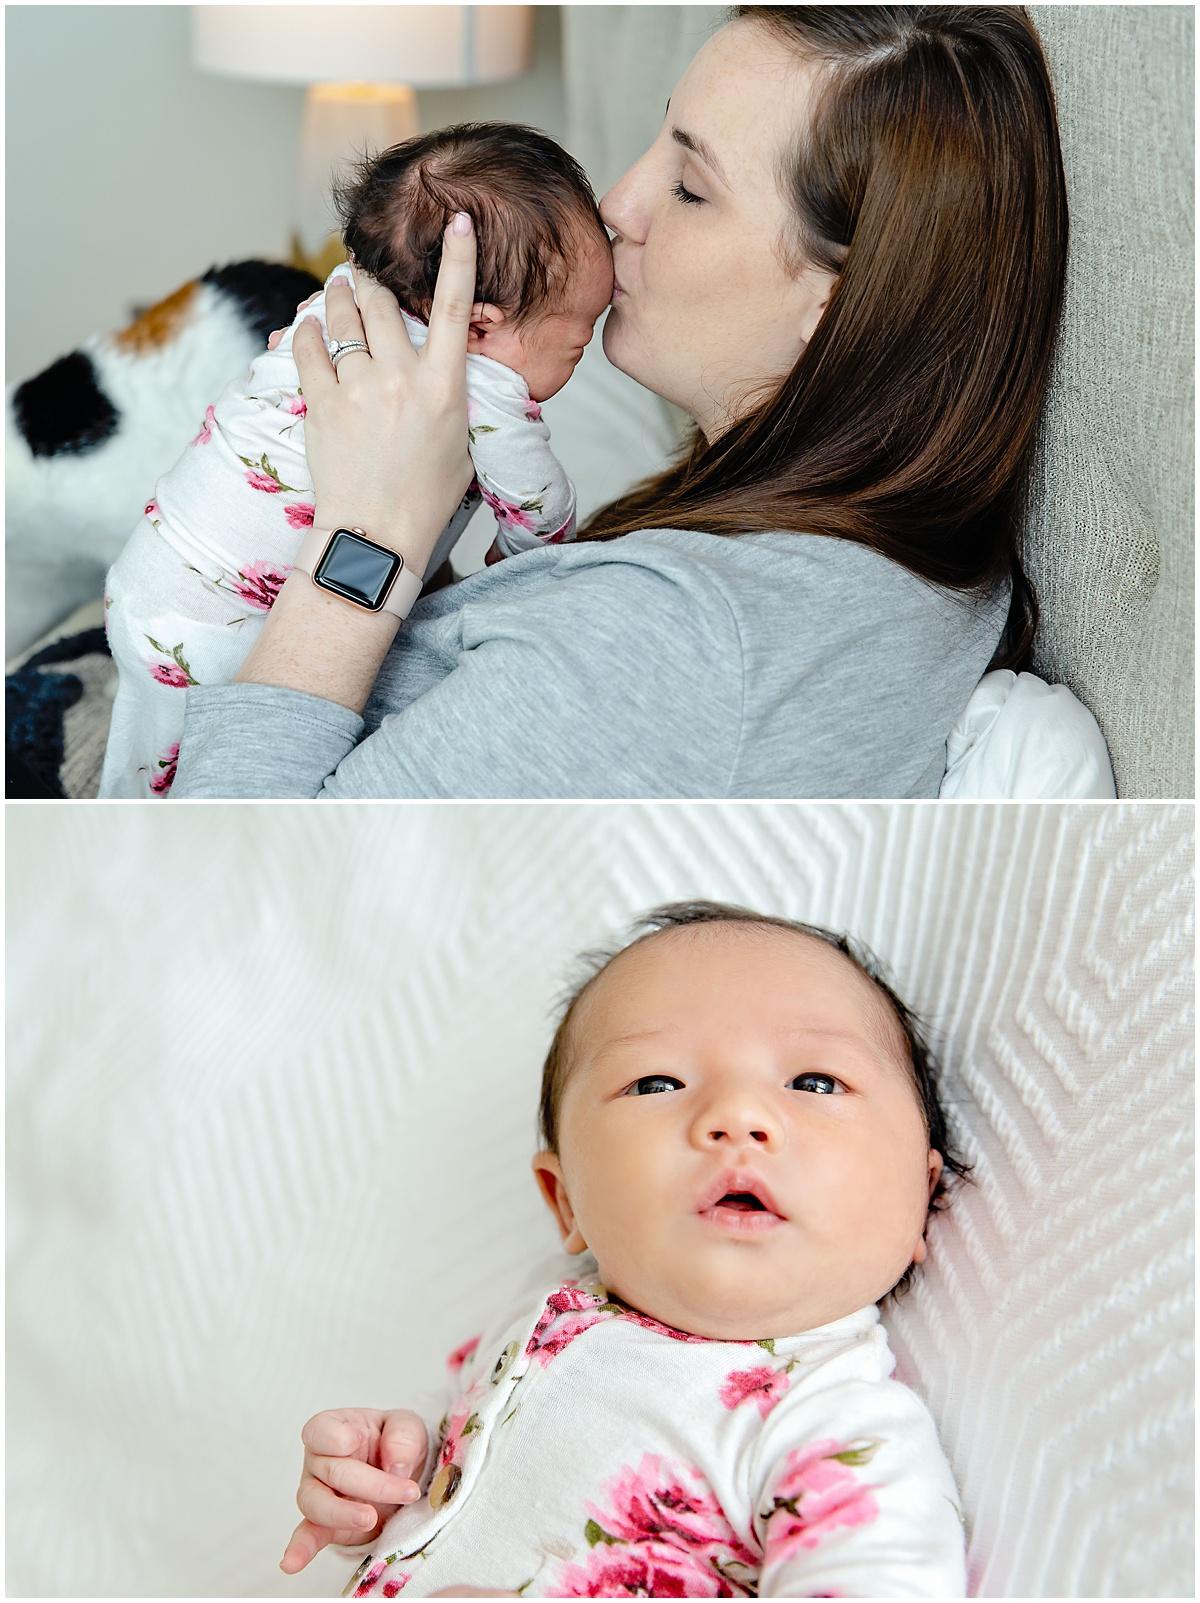 Lifestyle-newborn-family-photos-san-antonio-texas-carly-barton-photography_0007.jpg